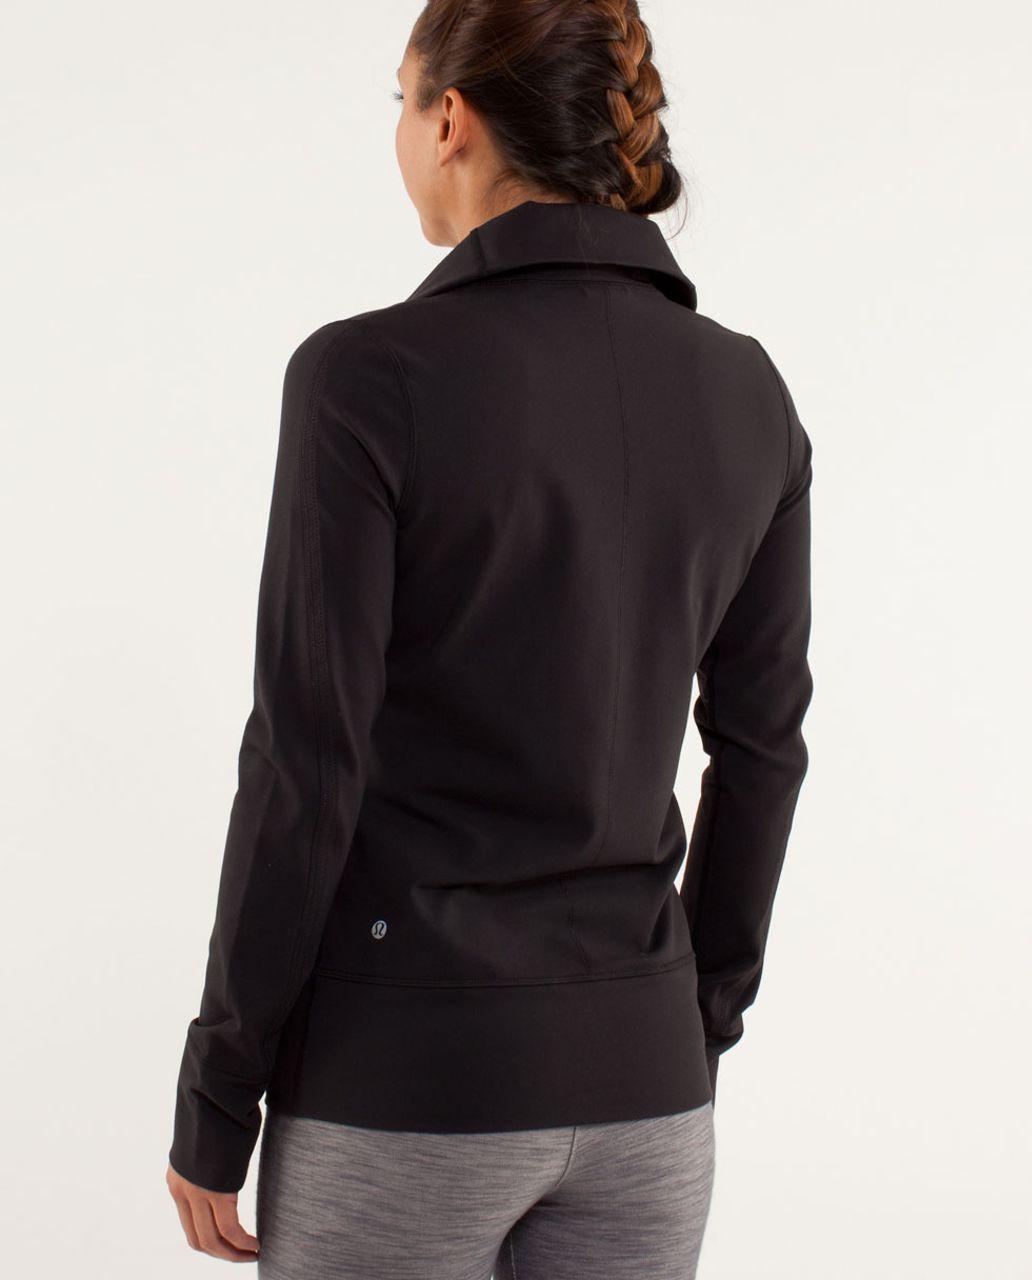 2b4c40635f Lululemon Daily Yoga Jacket - Black - lulu fanatics